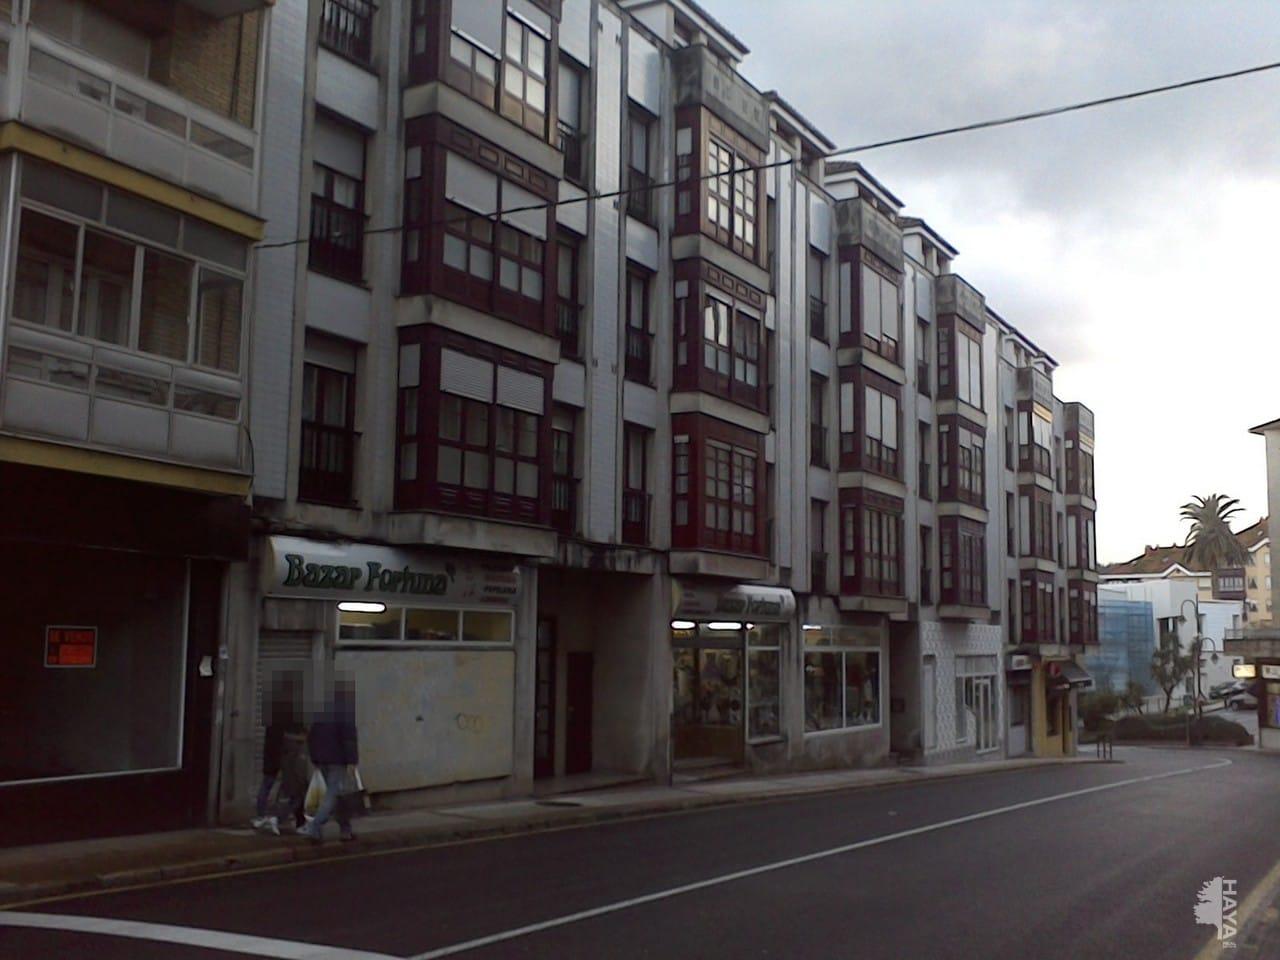 Local en venta en Carreño, Asturias, Avenida Reina Maria Cristina, 41.600 €, 90 m2